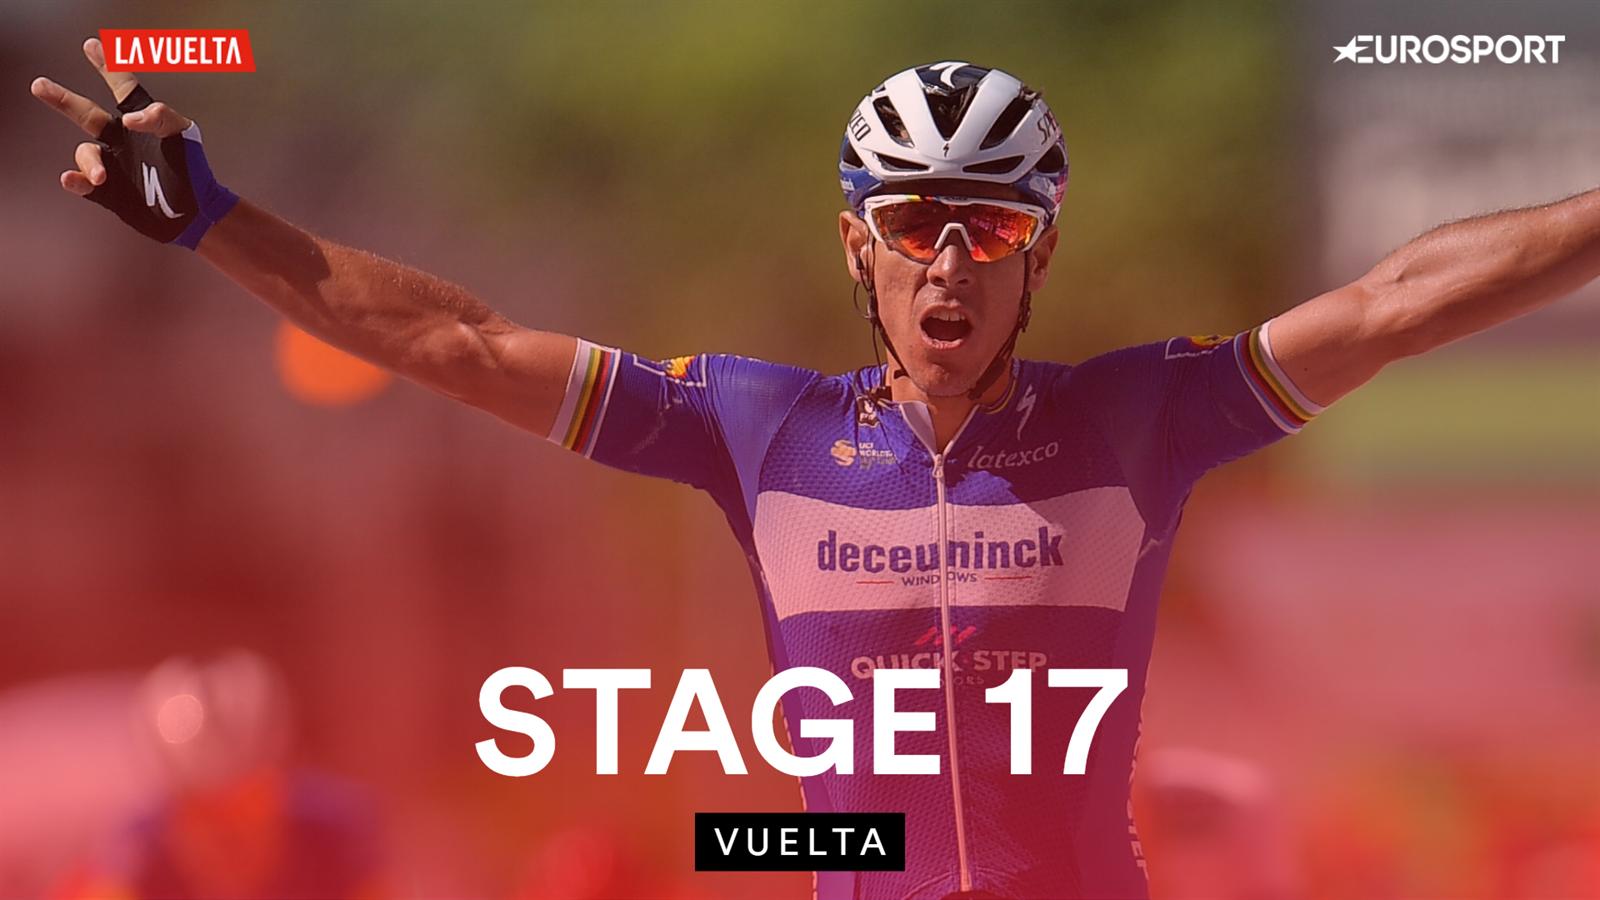 La Vuelta a Espana 2019 - Philippe Gilbert wins Stage 17 as